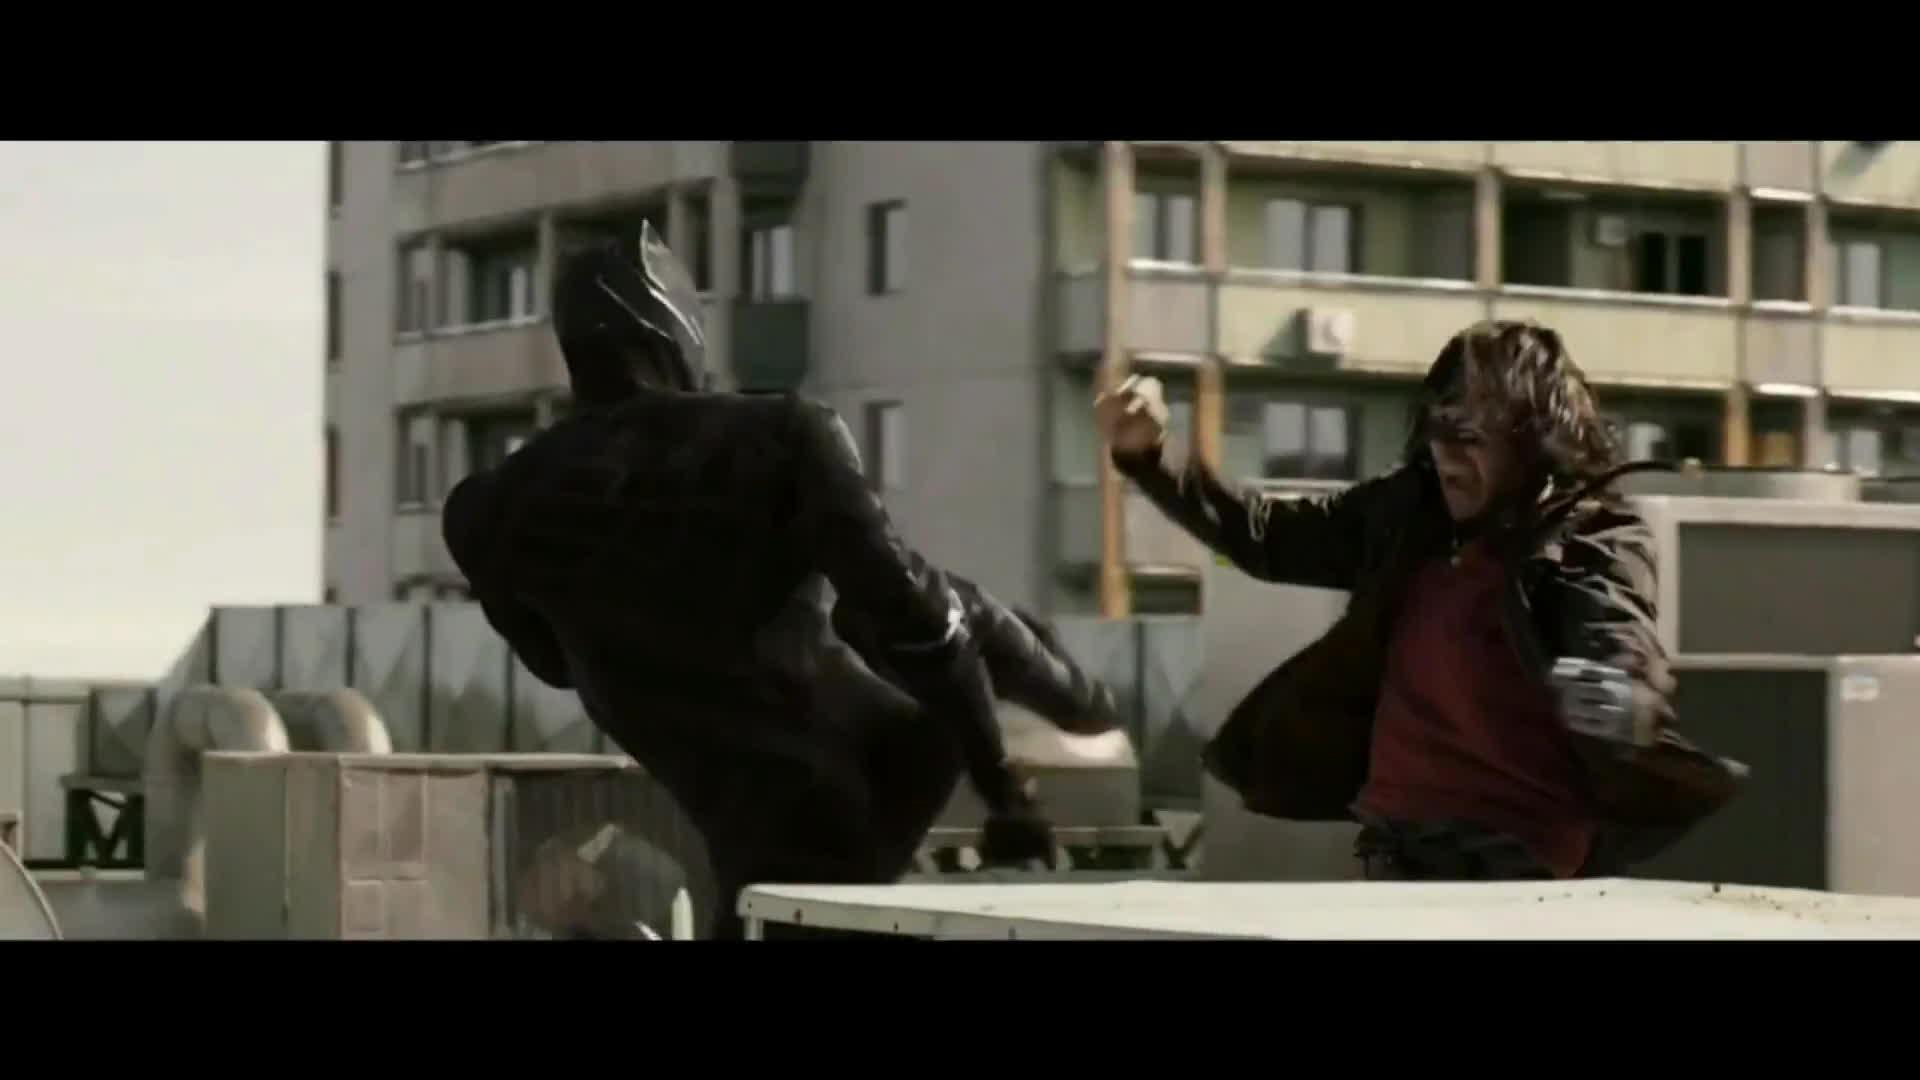 marvelstudios, Captain America: Civil War   Bucky Vs Black Panther   1080p Blu-Ray GIFs